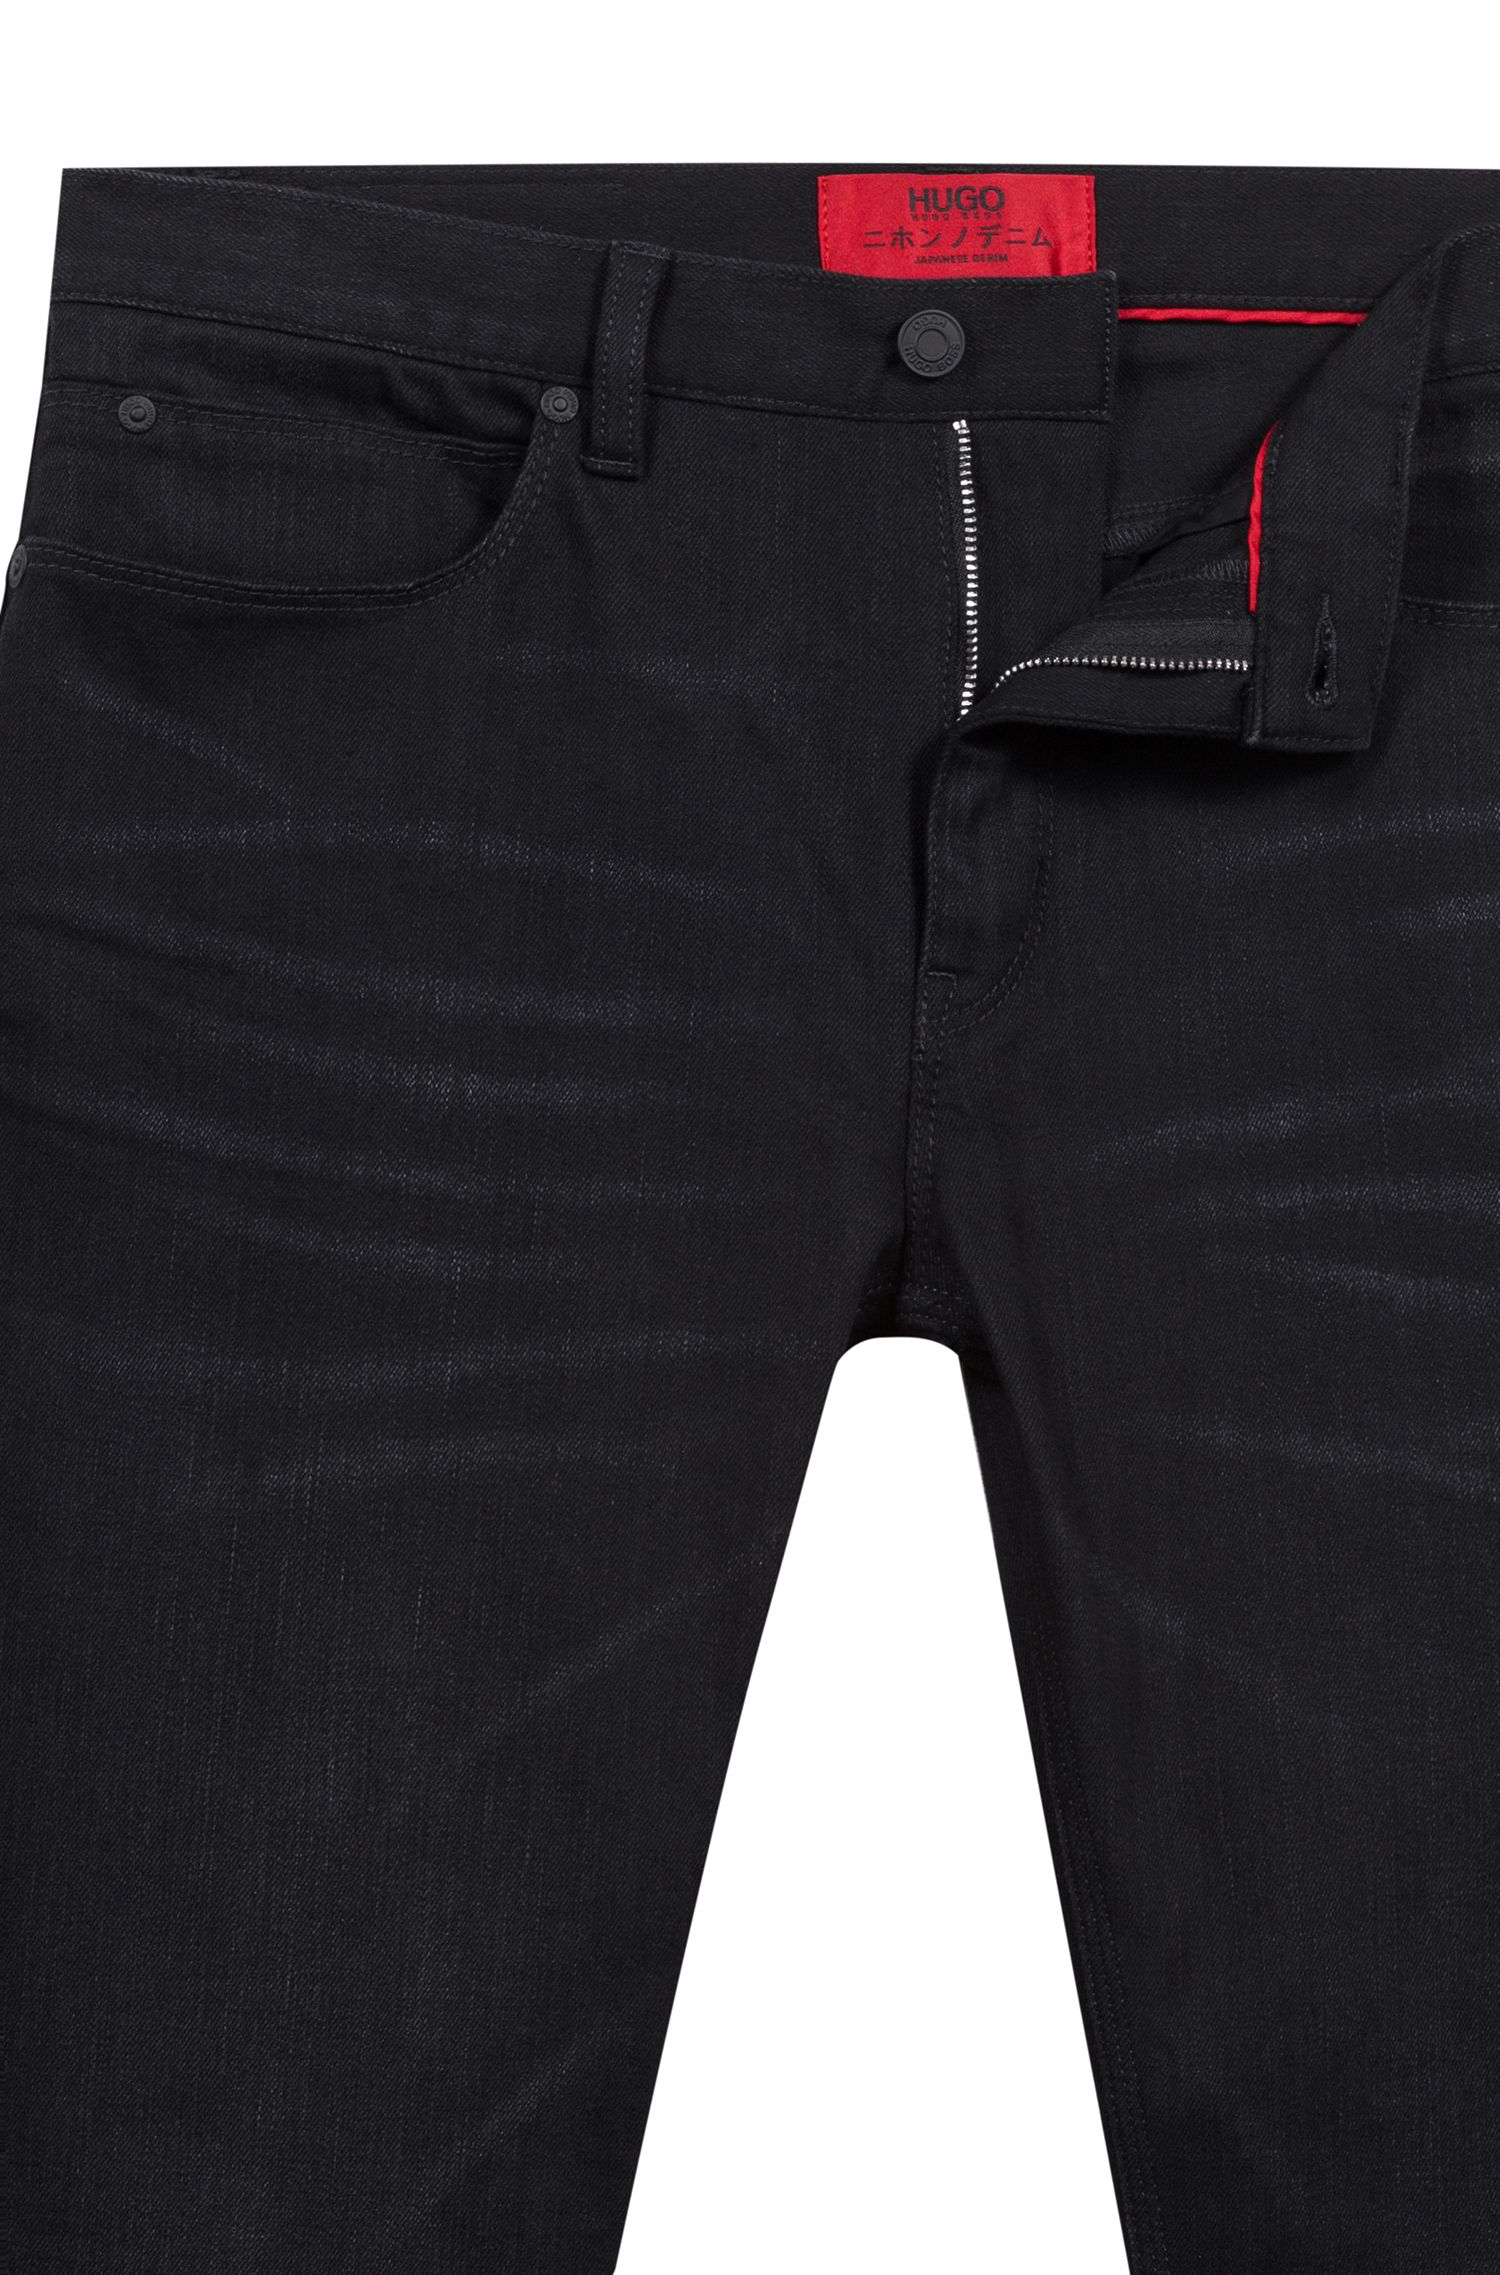 Skinny-fit jeans in black Japanese denim, Charcoal